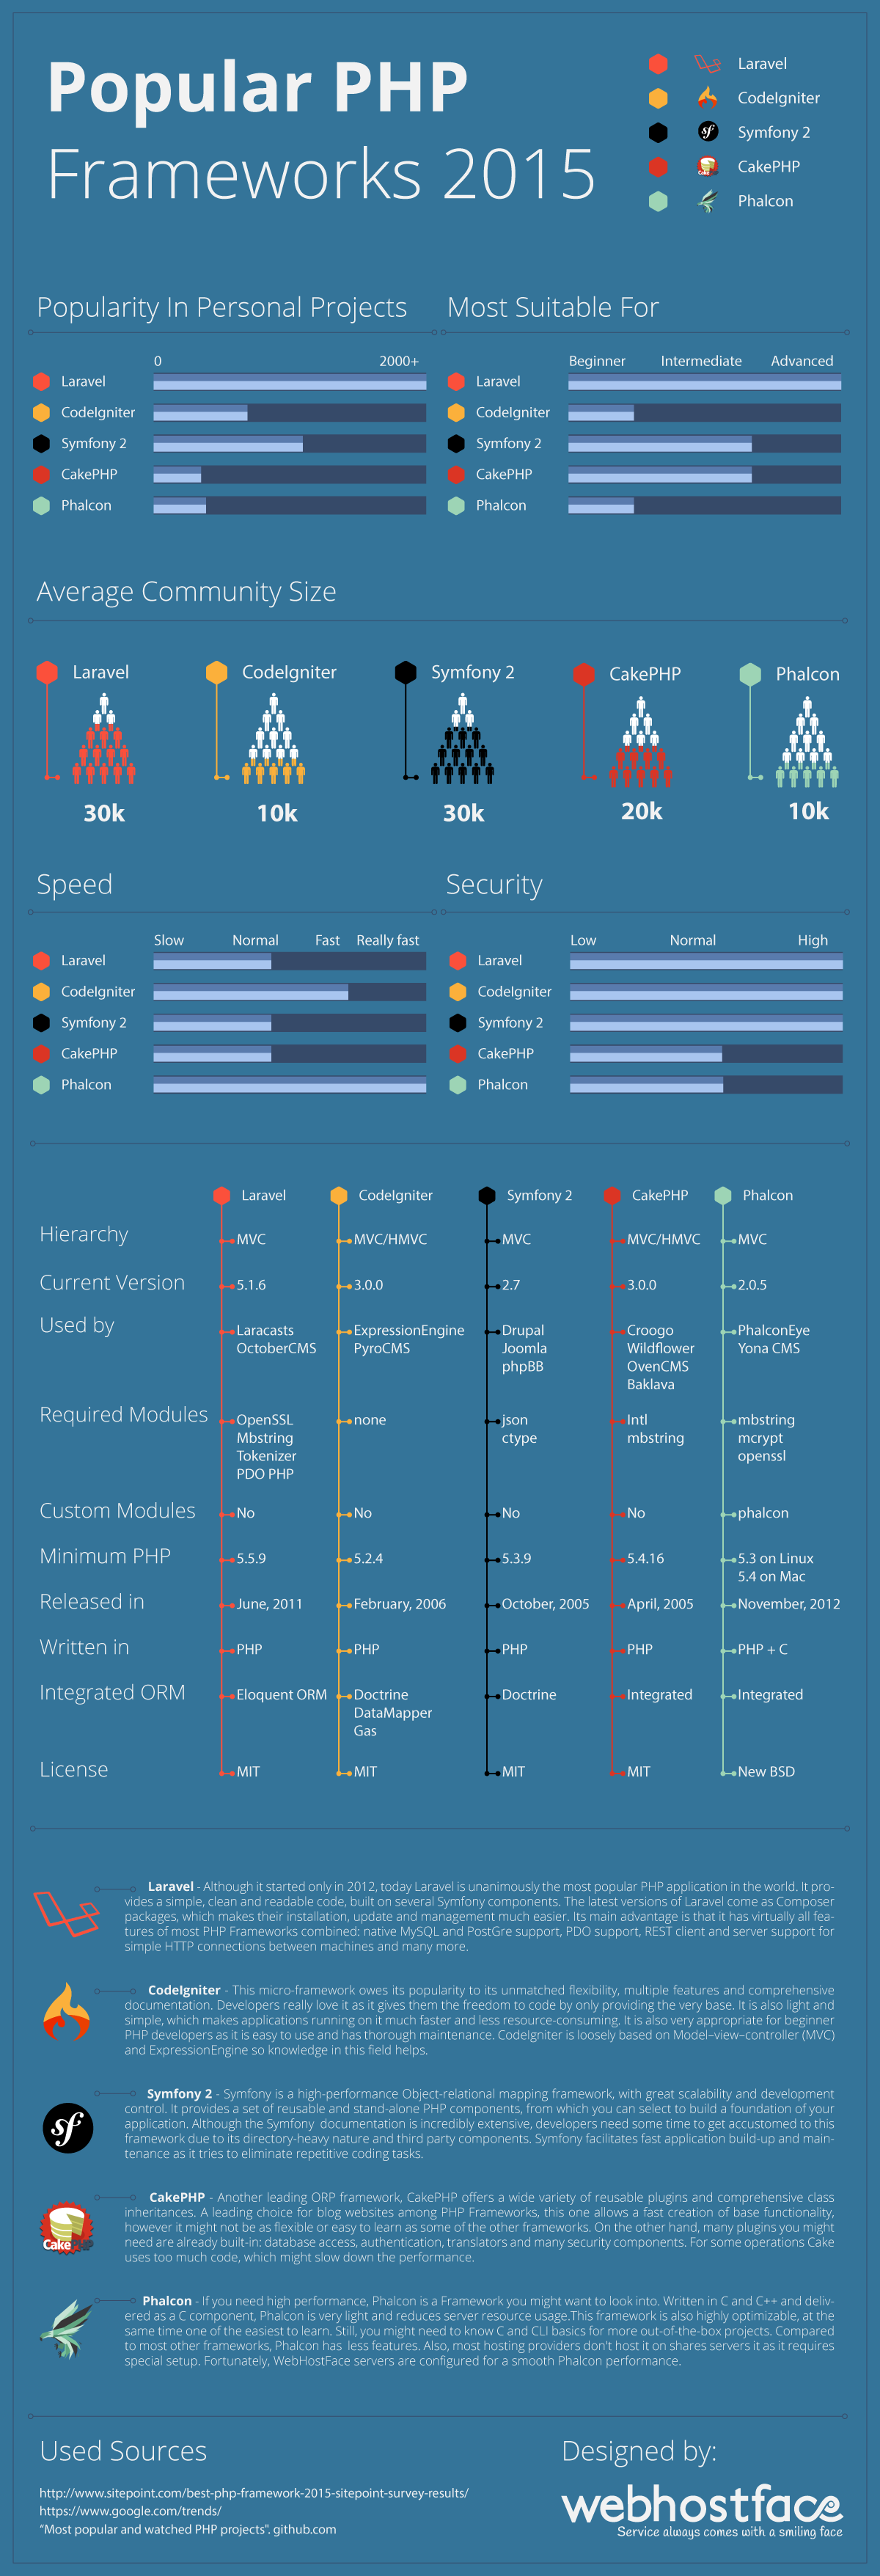 Popular PHP Frameworks 2015 Infographic